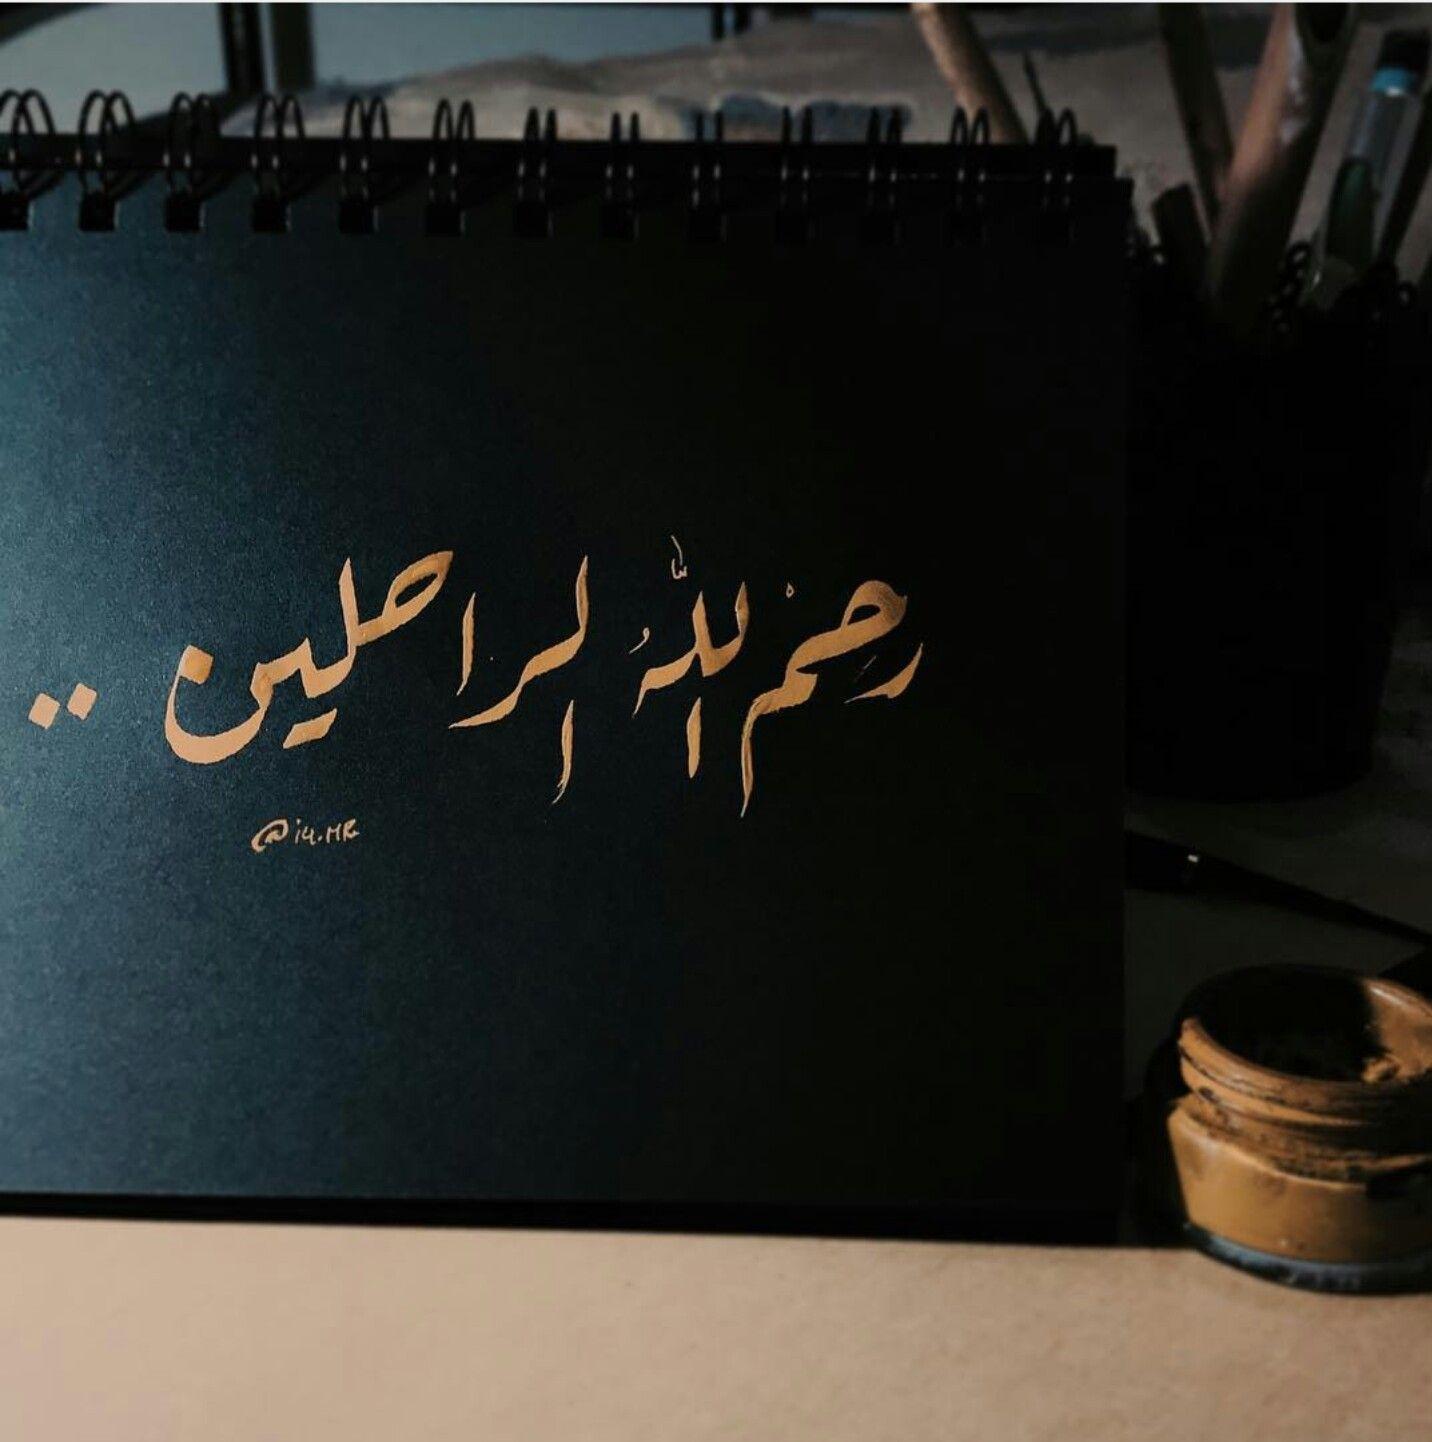 Pin By La Reina Aya On كتابه على الورق Ex Quotes Some Words Words